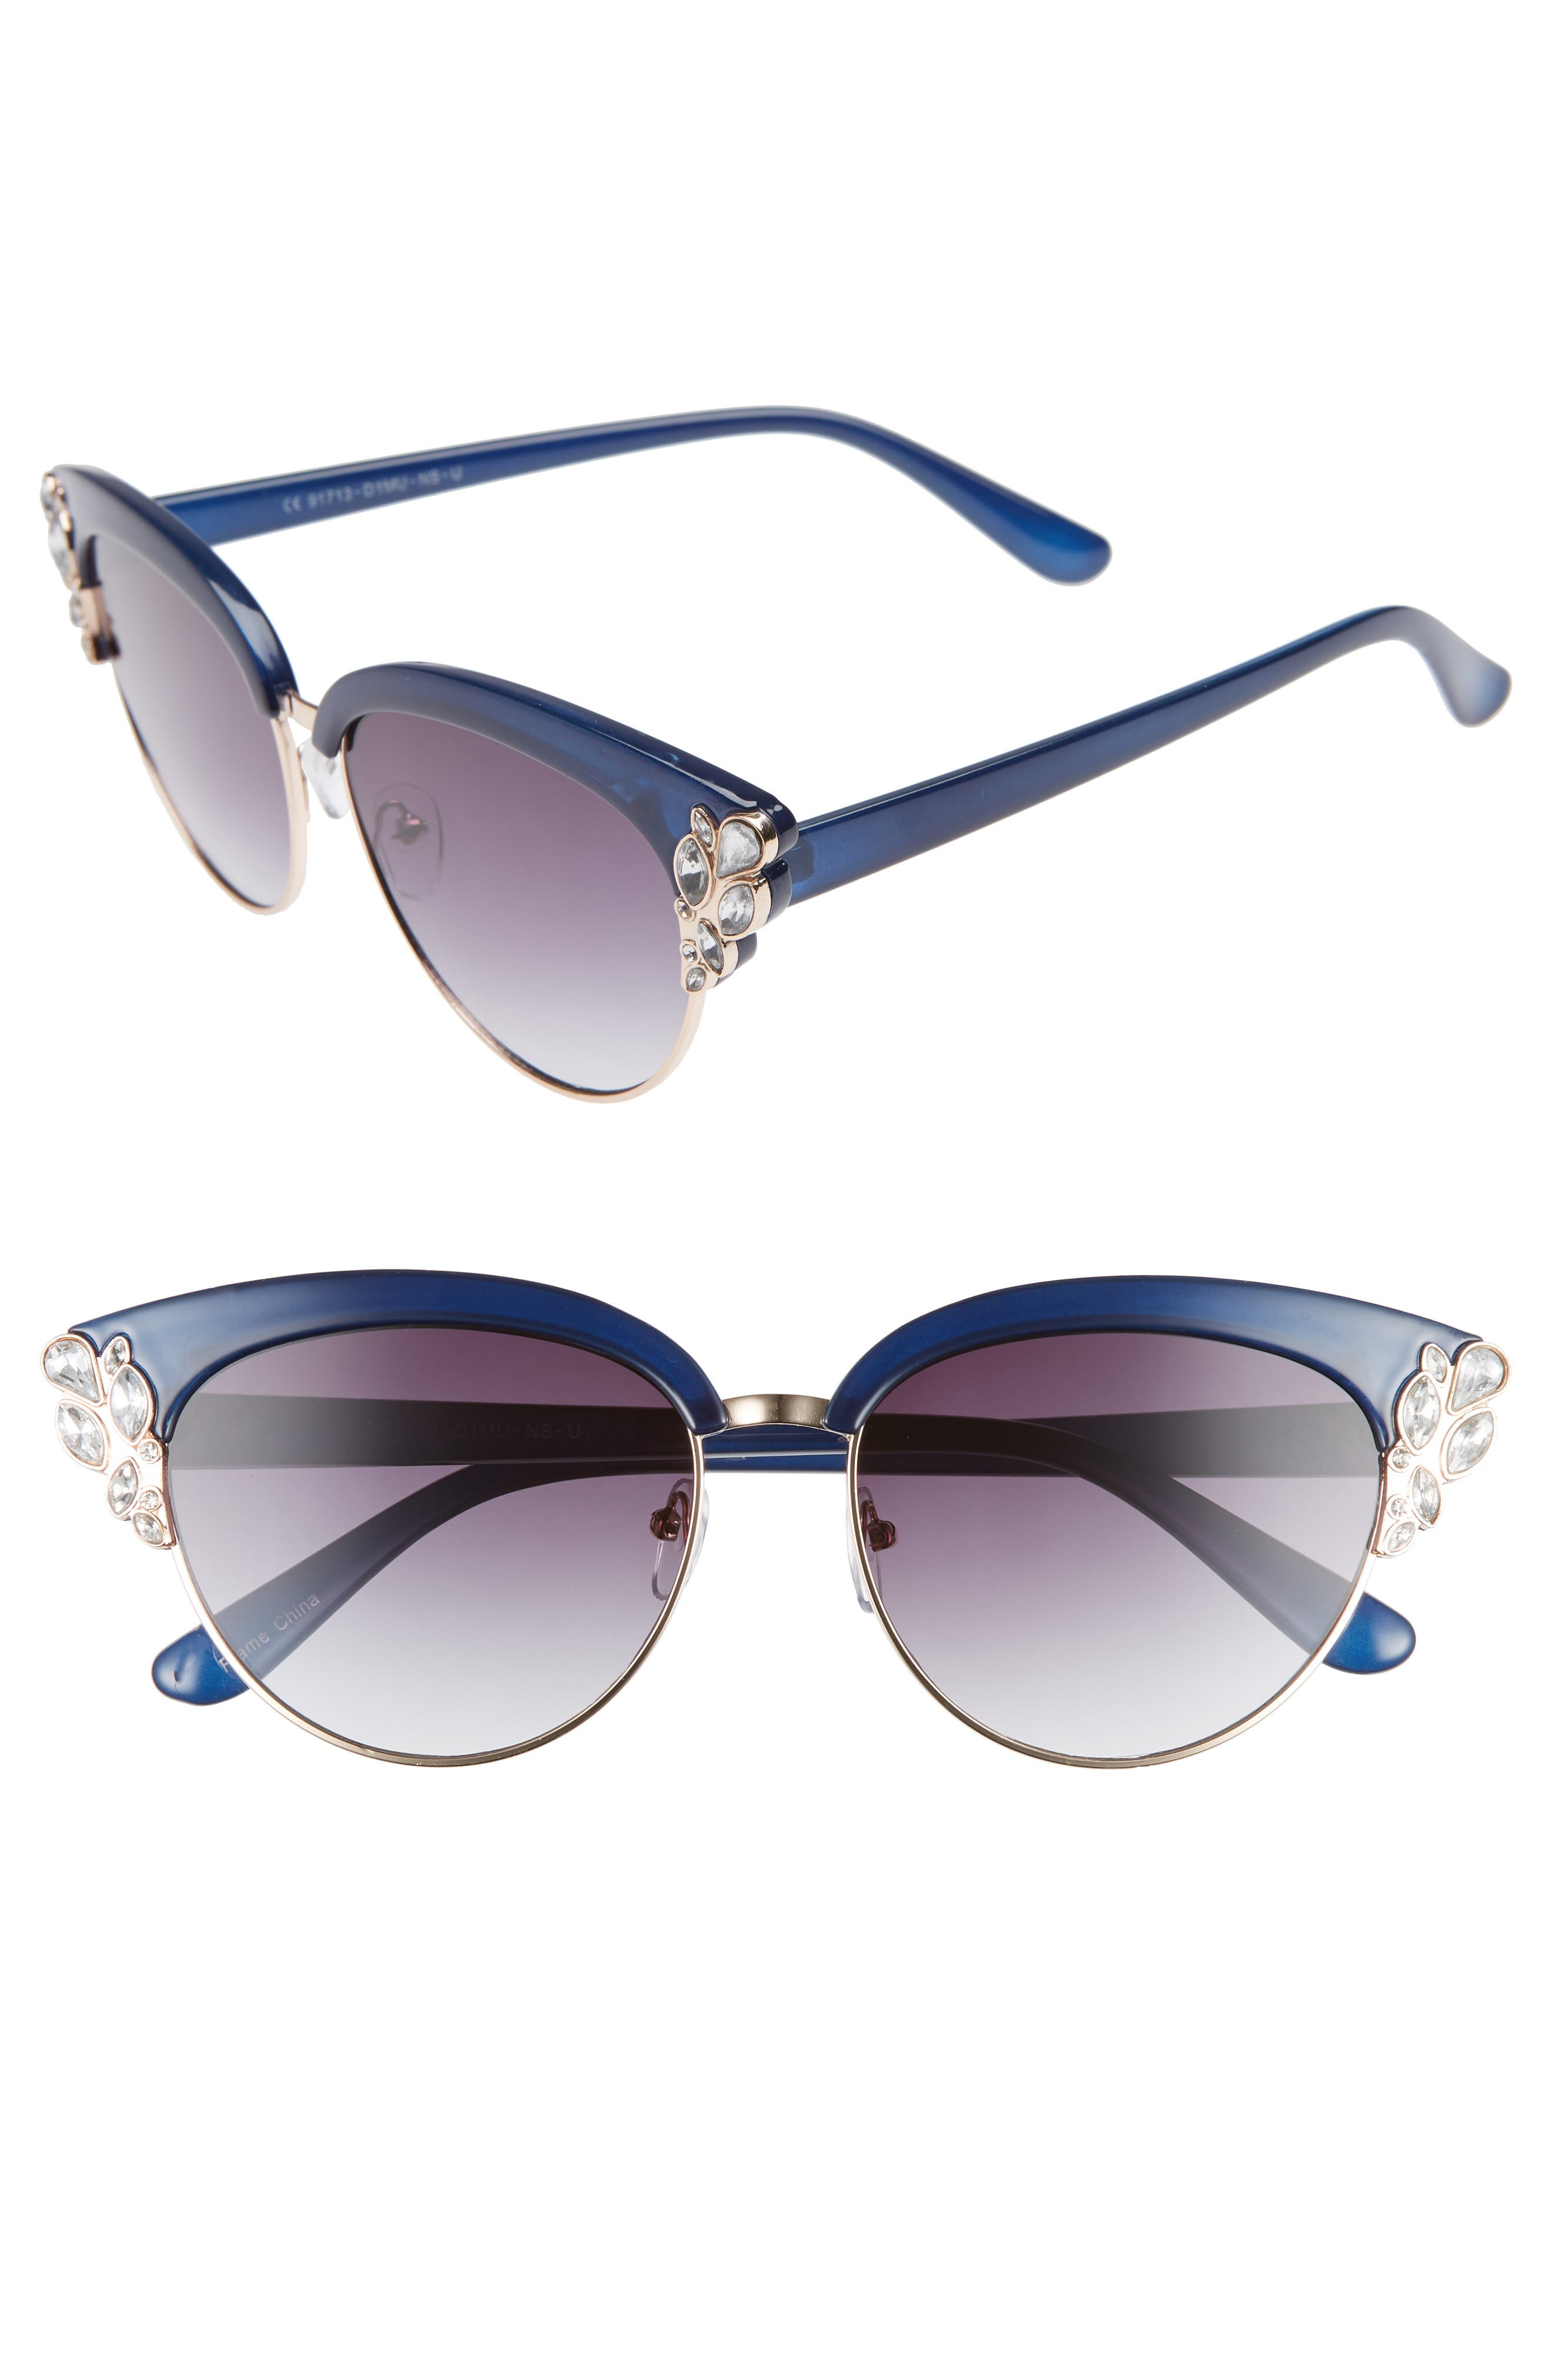 58mm Embellished Cat Eye Sunglasses,                             Main thumbnail 1, color,                             BLUE/ GOLD